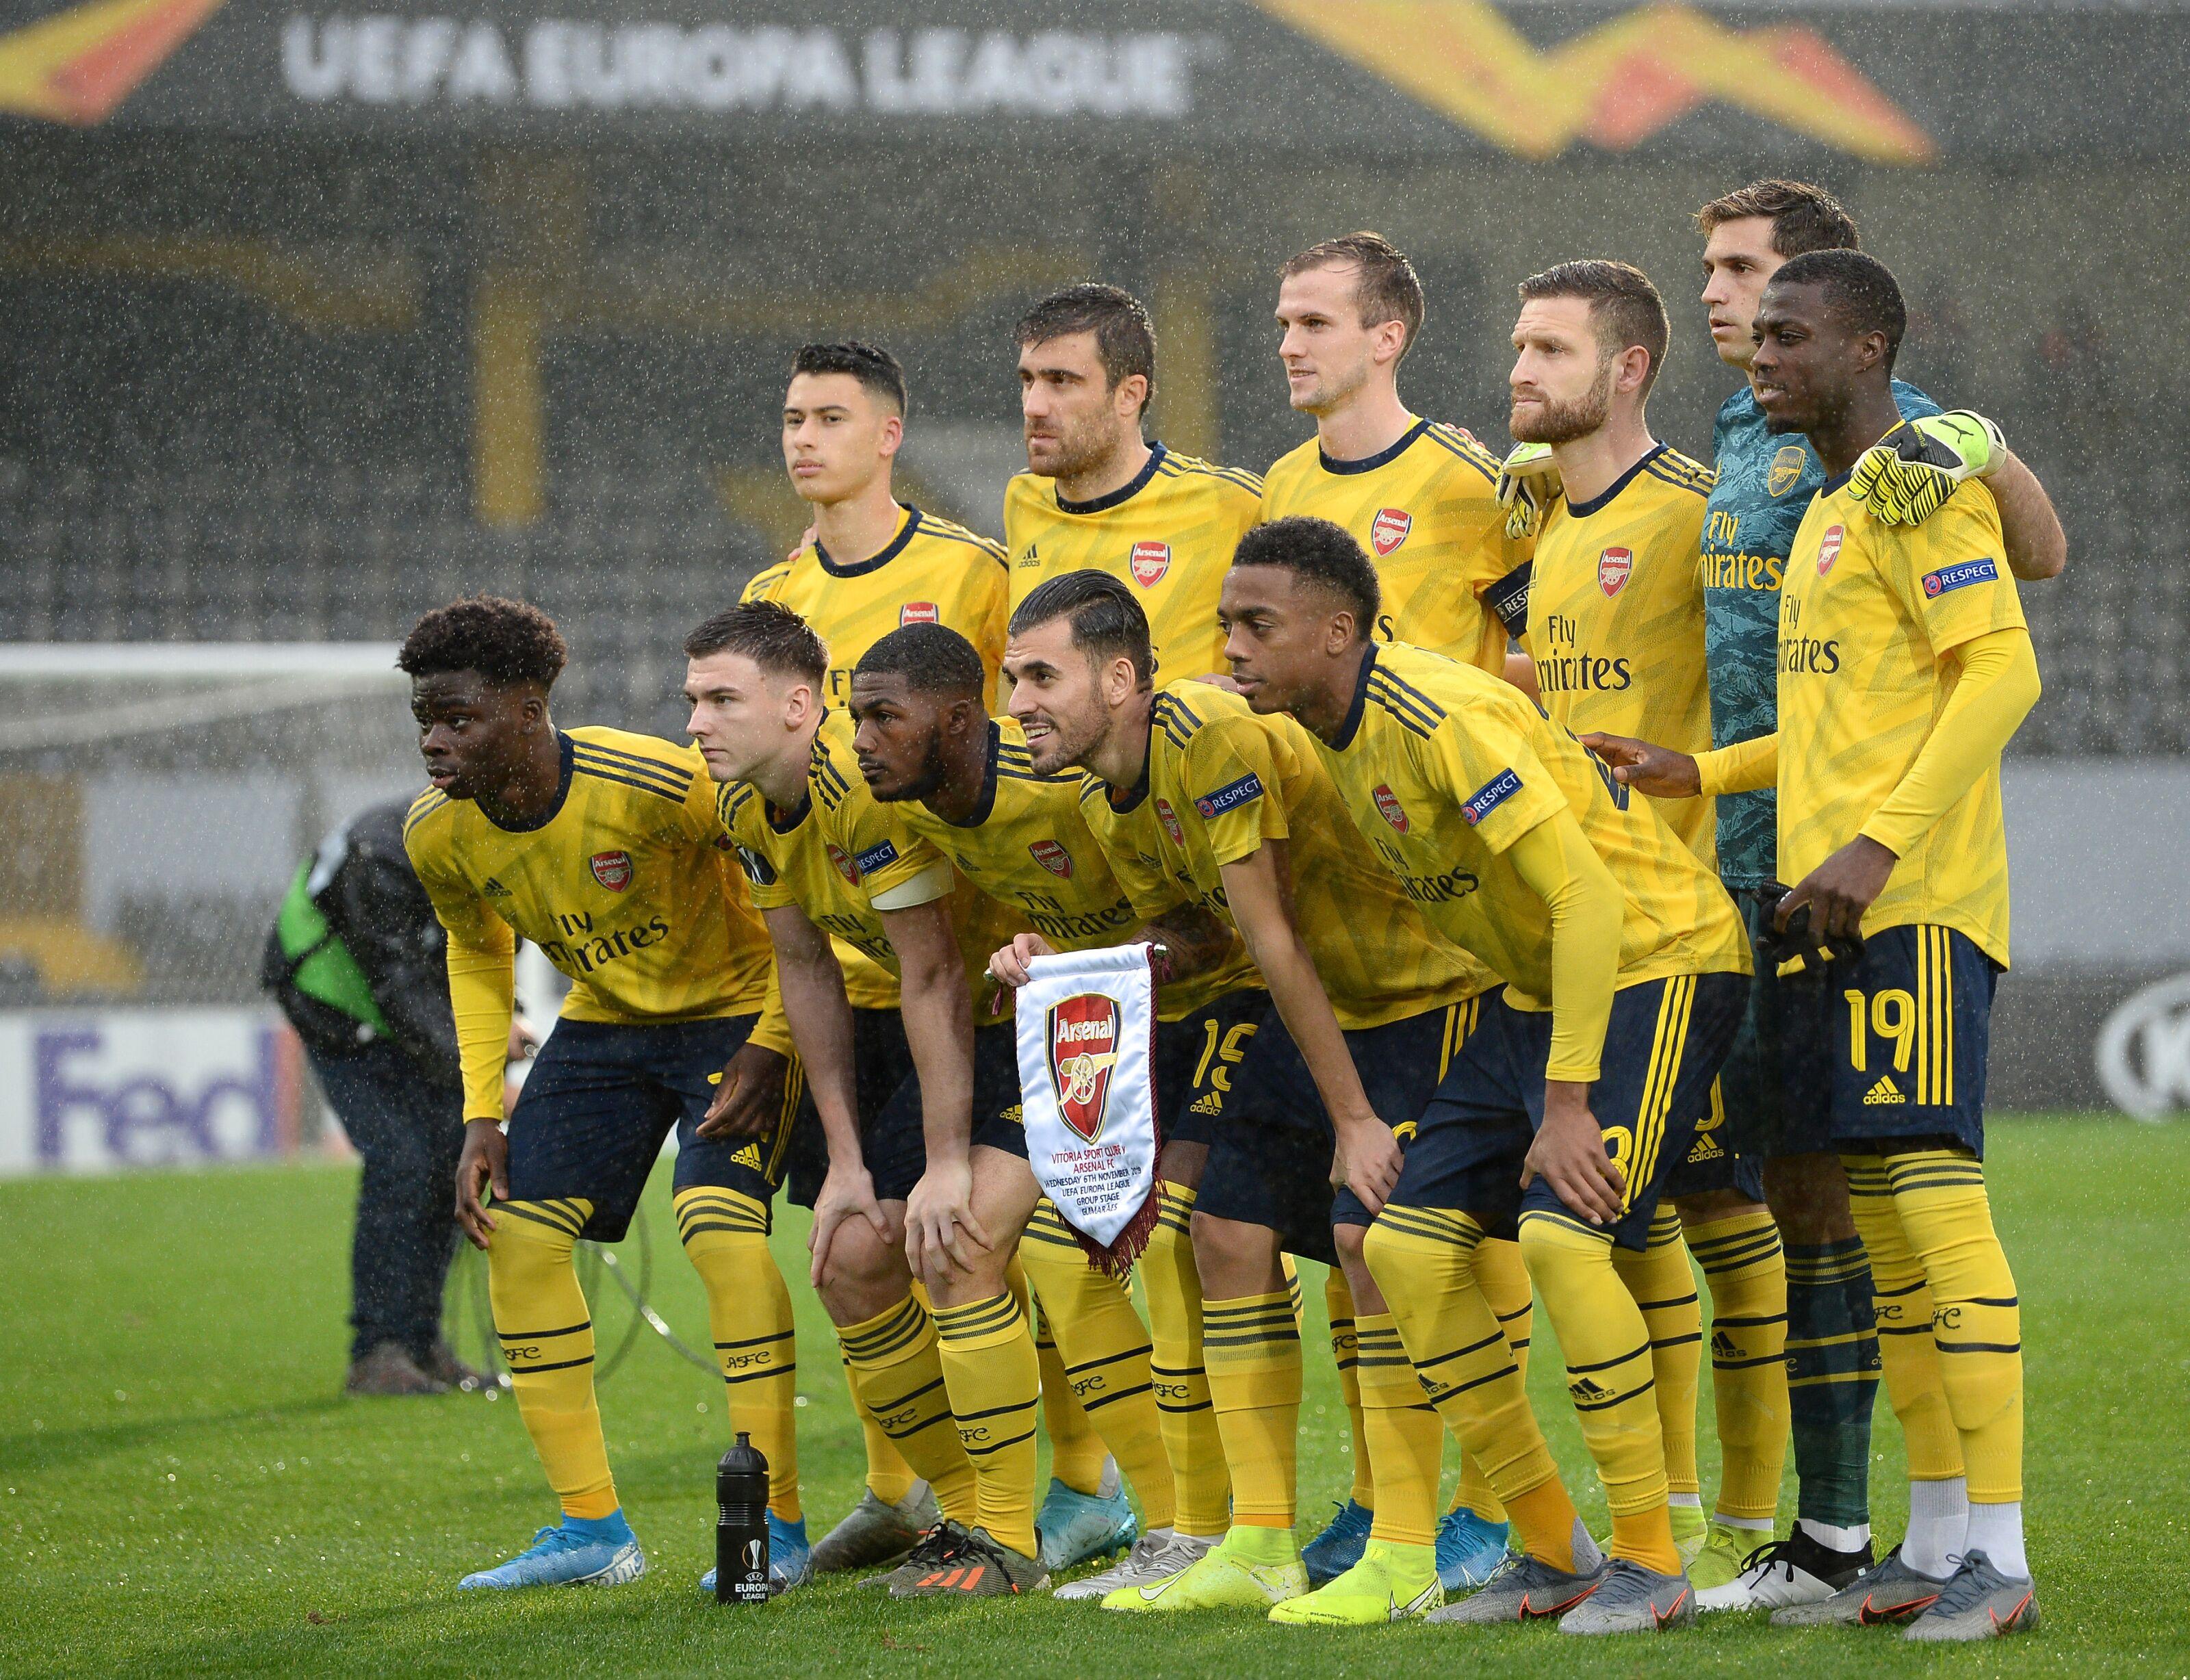 Hasil gambar untuk Vitoria SC 1-1 Arsenal